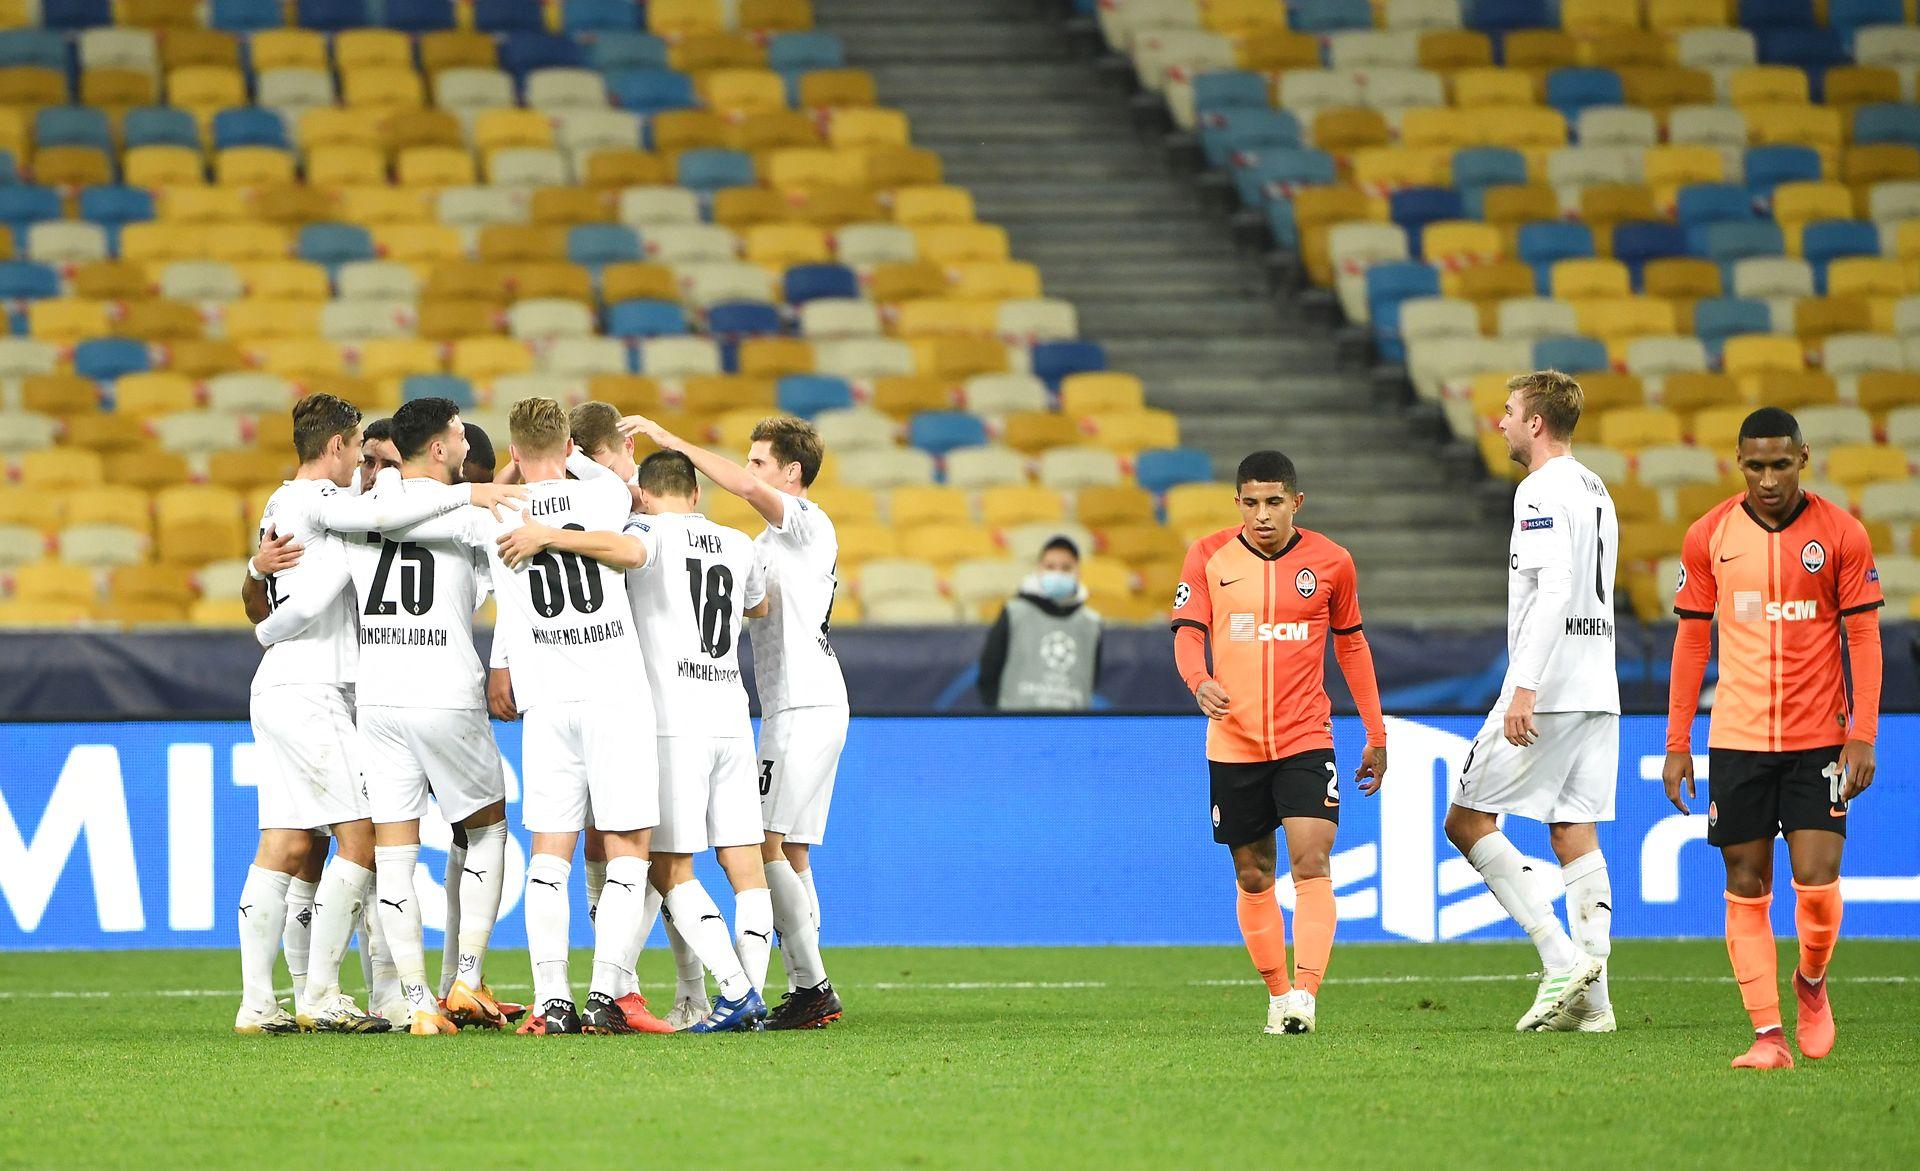 Optakt: Borussia Mönchengladbach - Shakhtar Donetsk